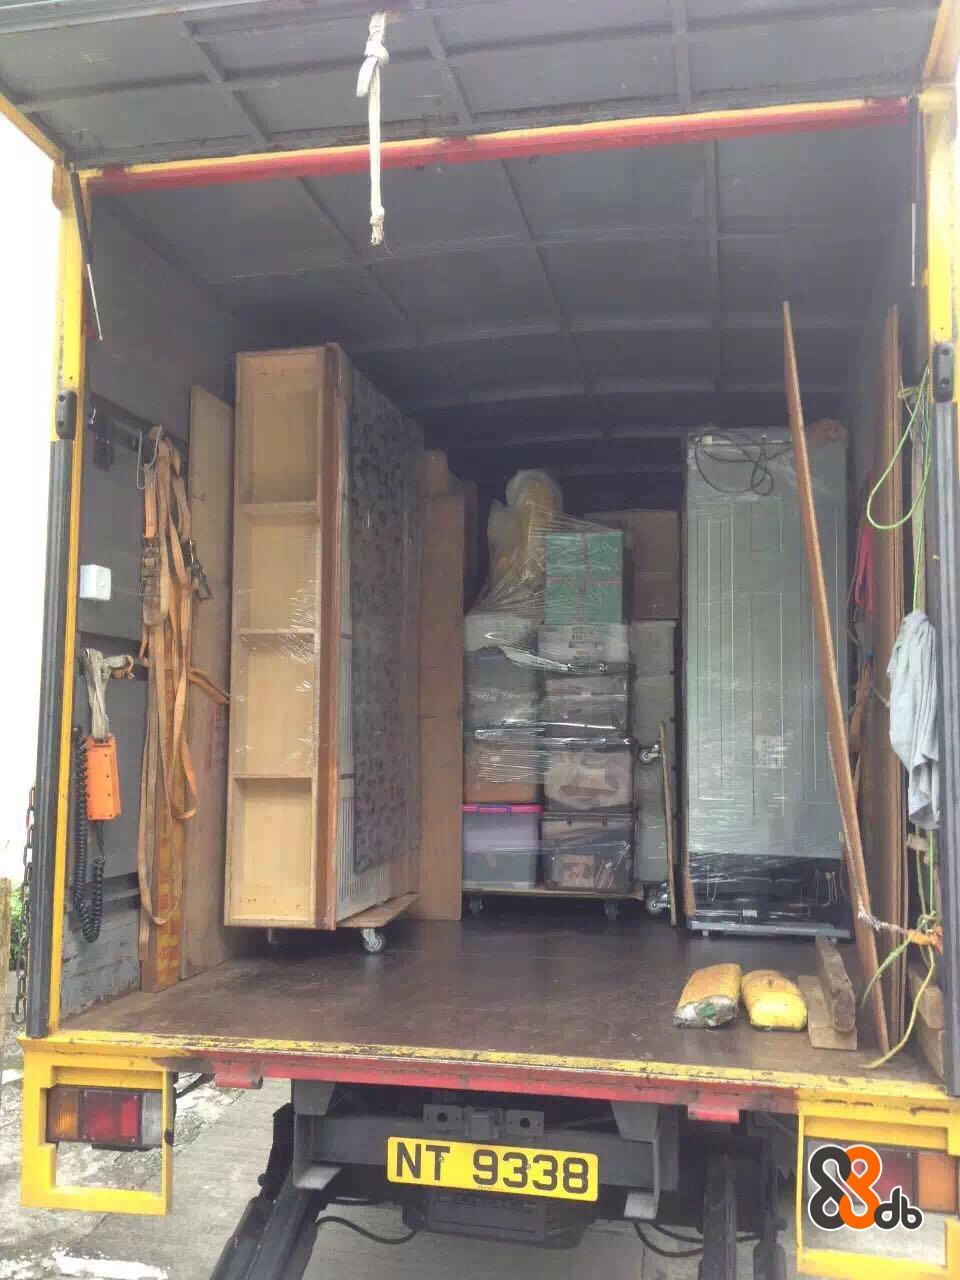 NT 9338 db  transport